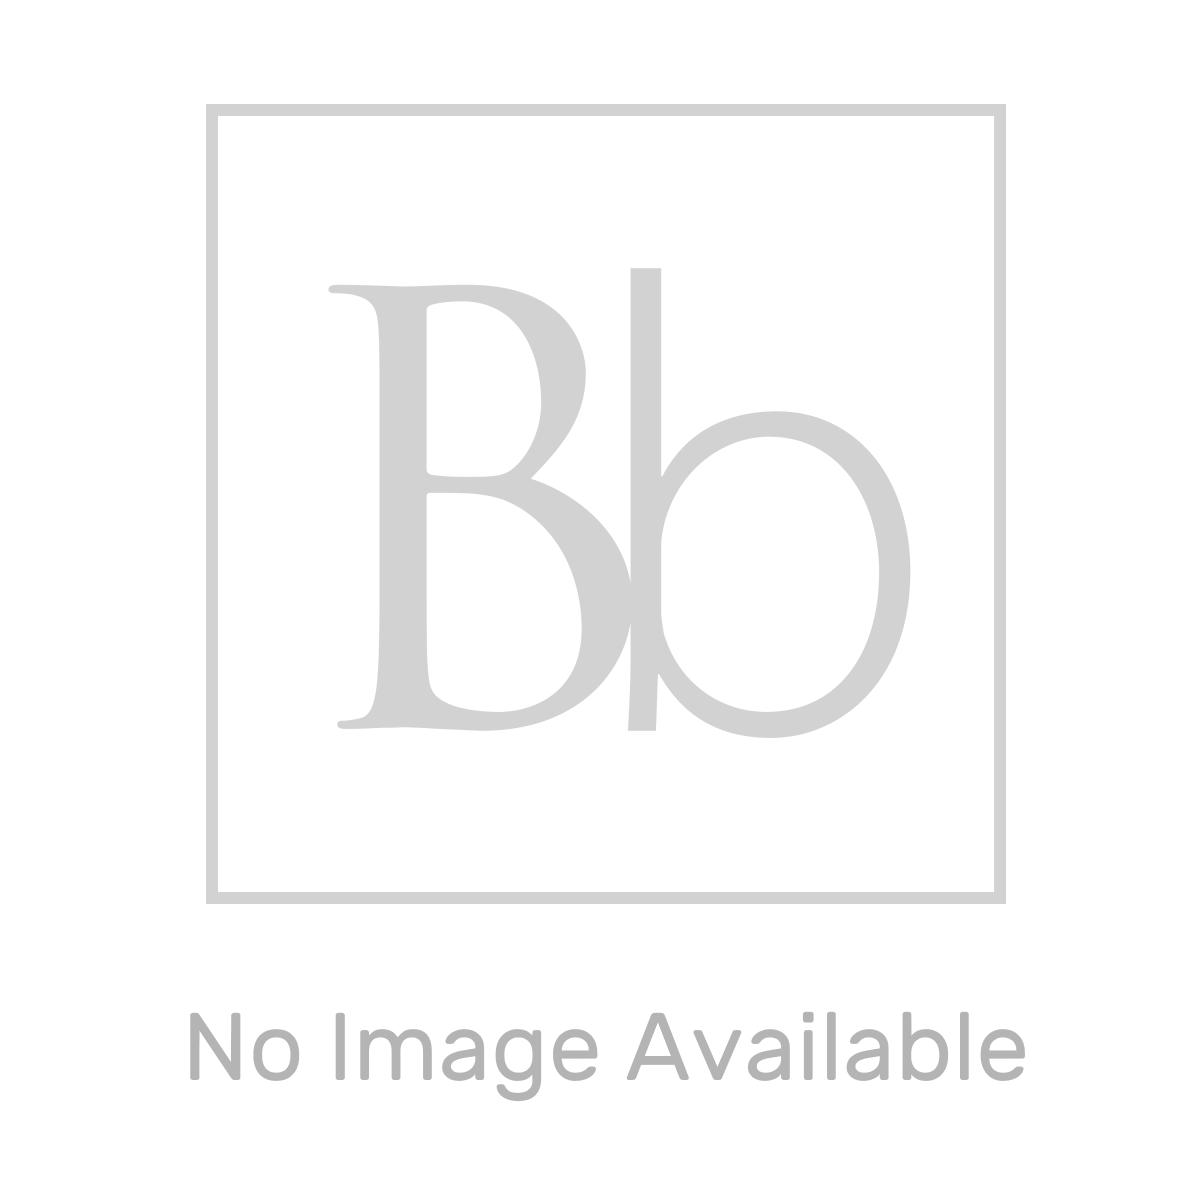 April Rectangular Anti Slip Shower Tray 1000 x 900 Line Drawing